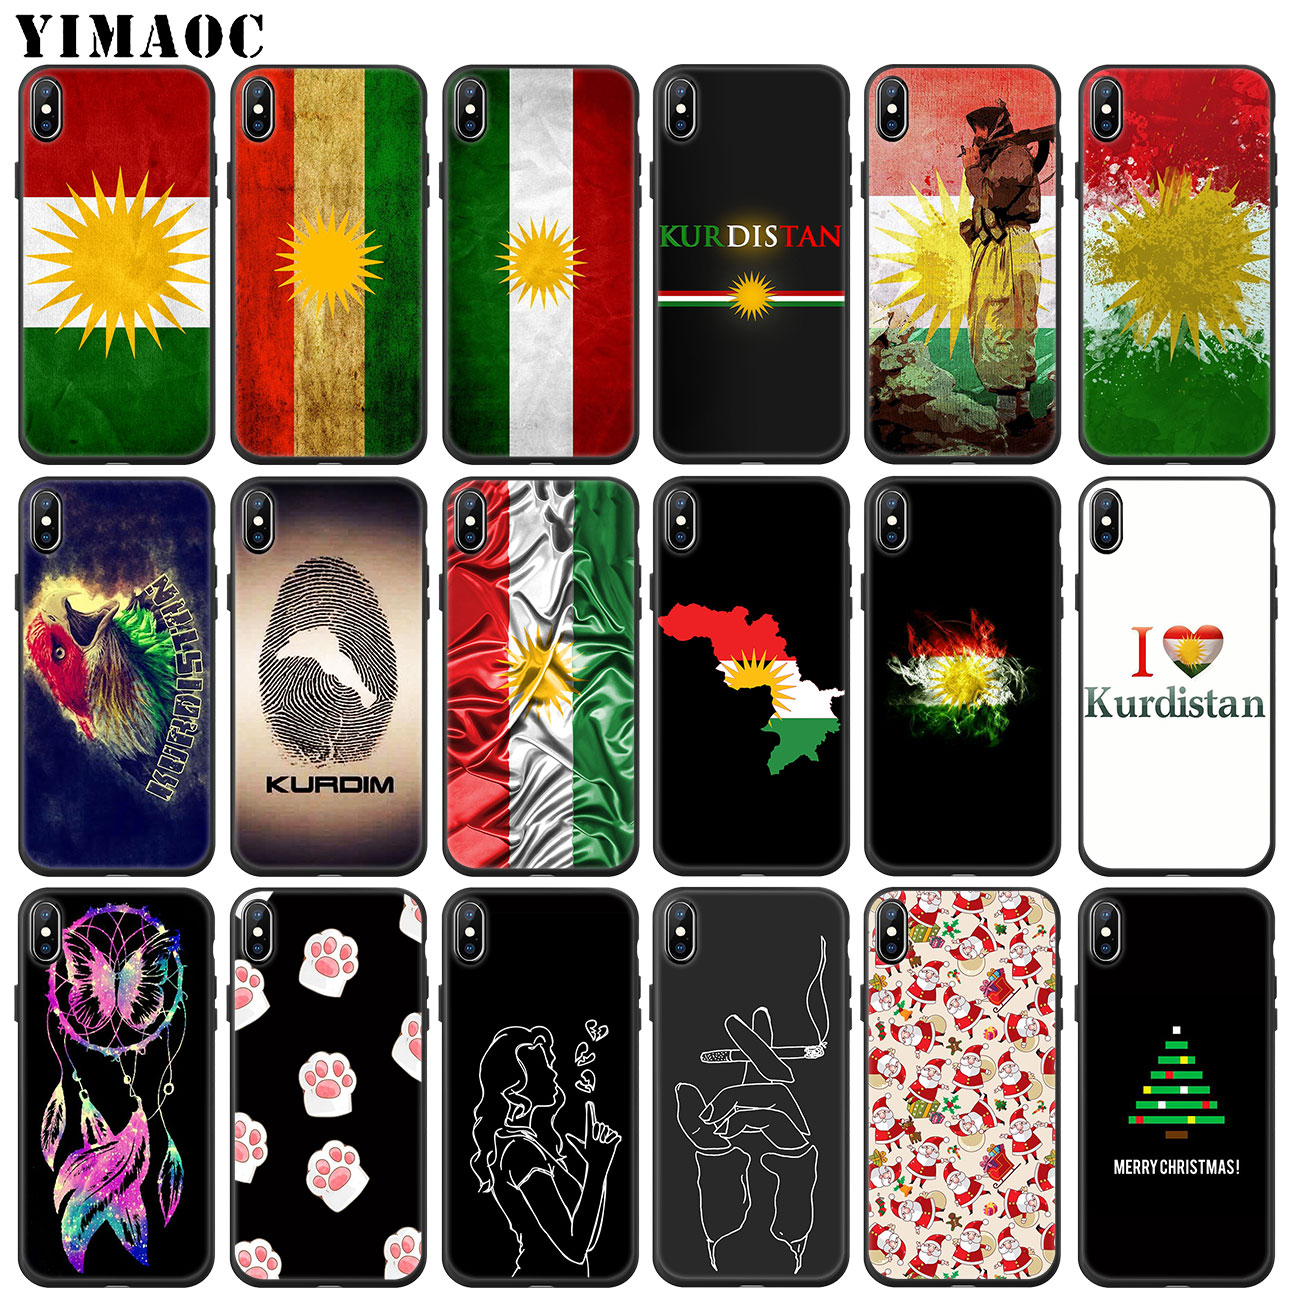 Funda de silicona suave con bandera regional kurda de YIMAOC para iPhone 11 Pro XS Max XR X 6 6S 7 8 Plus 5 5S SE 10 cubierta negra